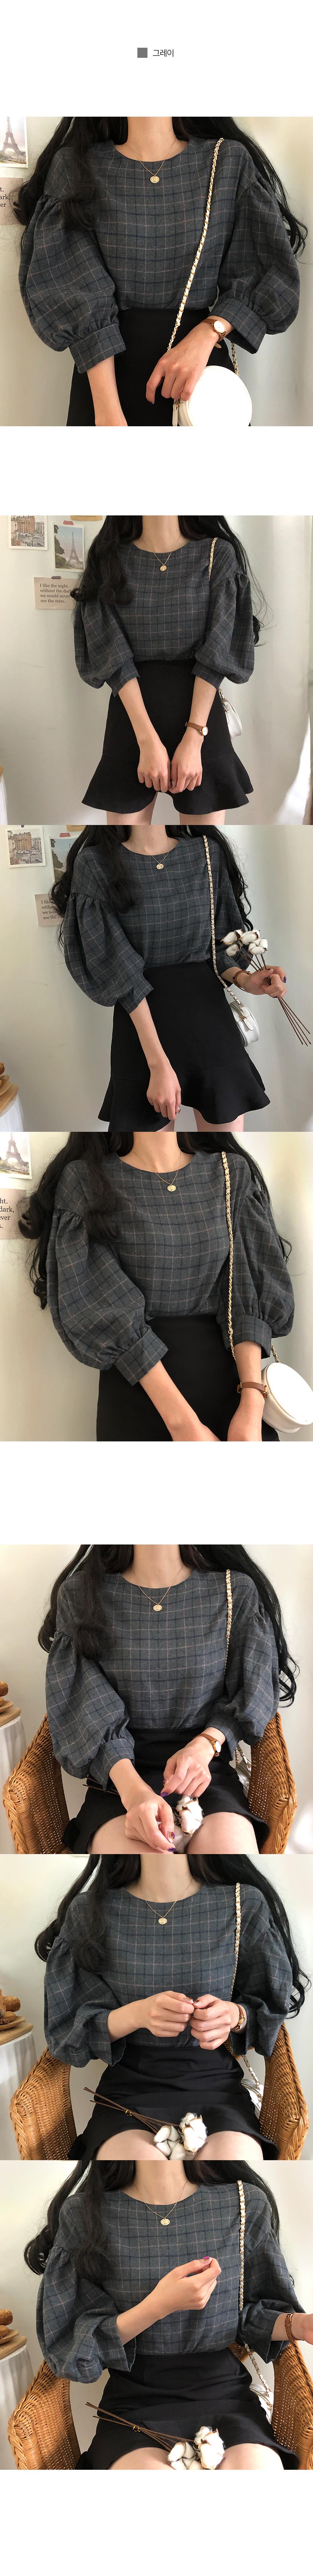 Monaca puff check blouse